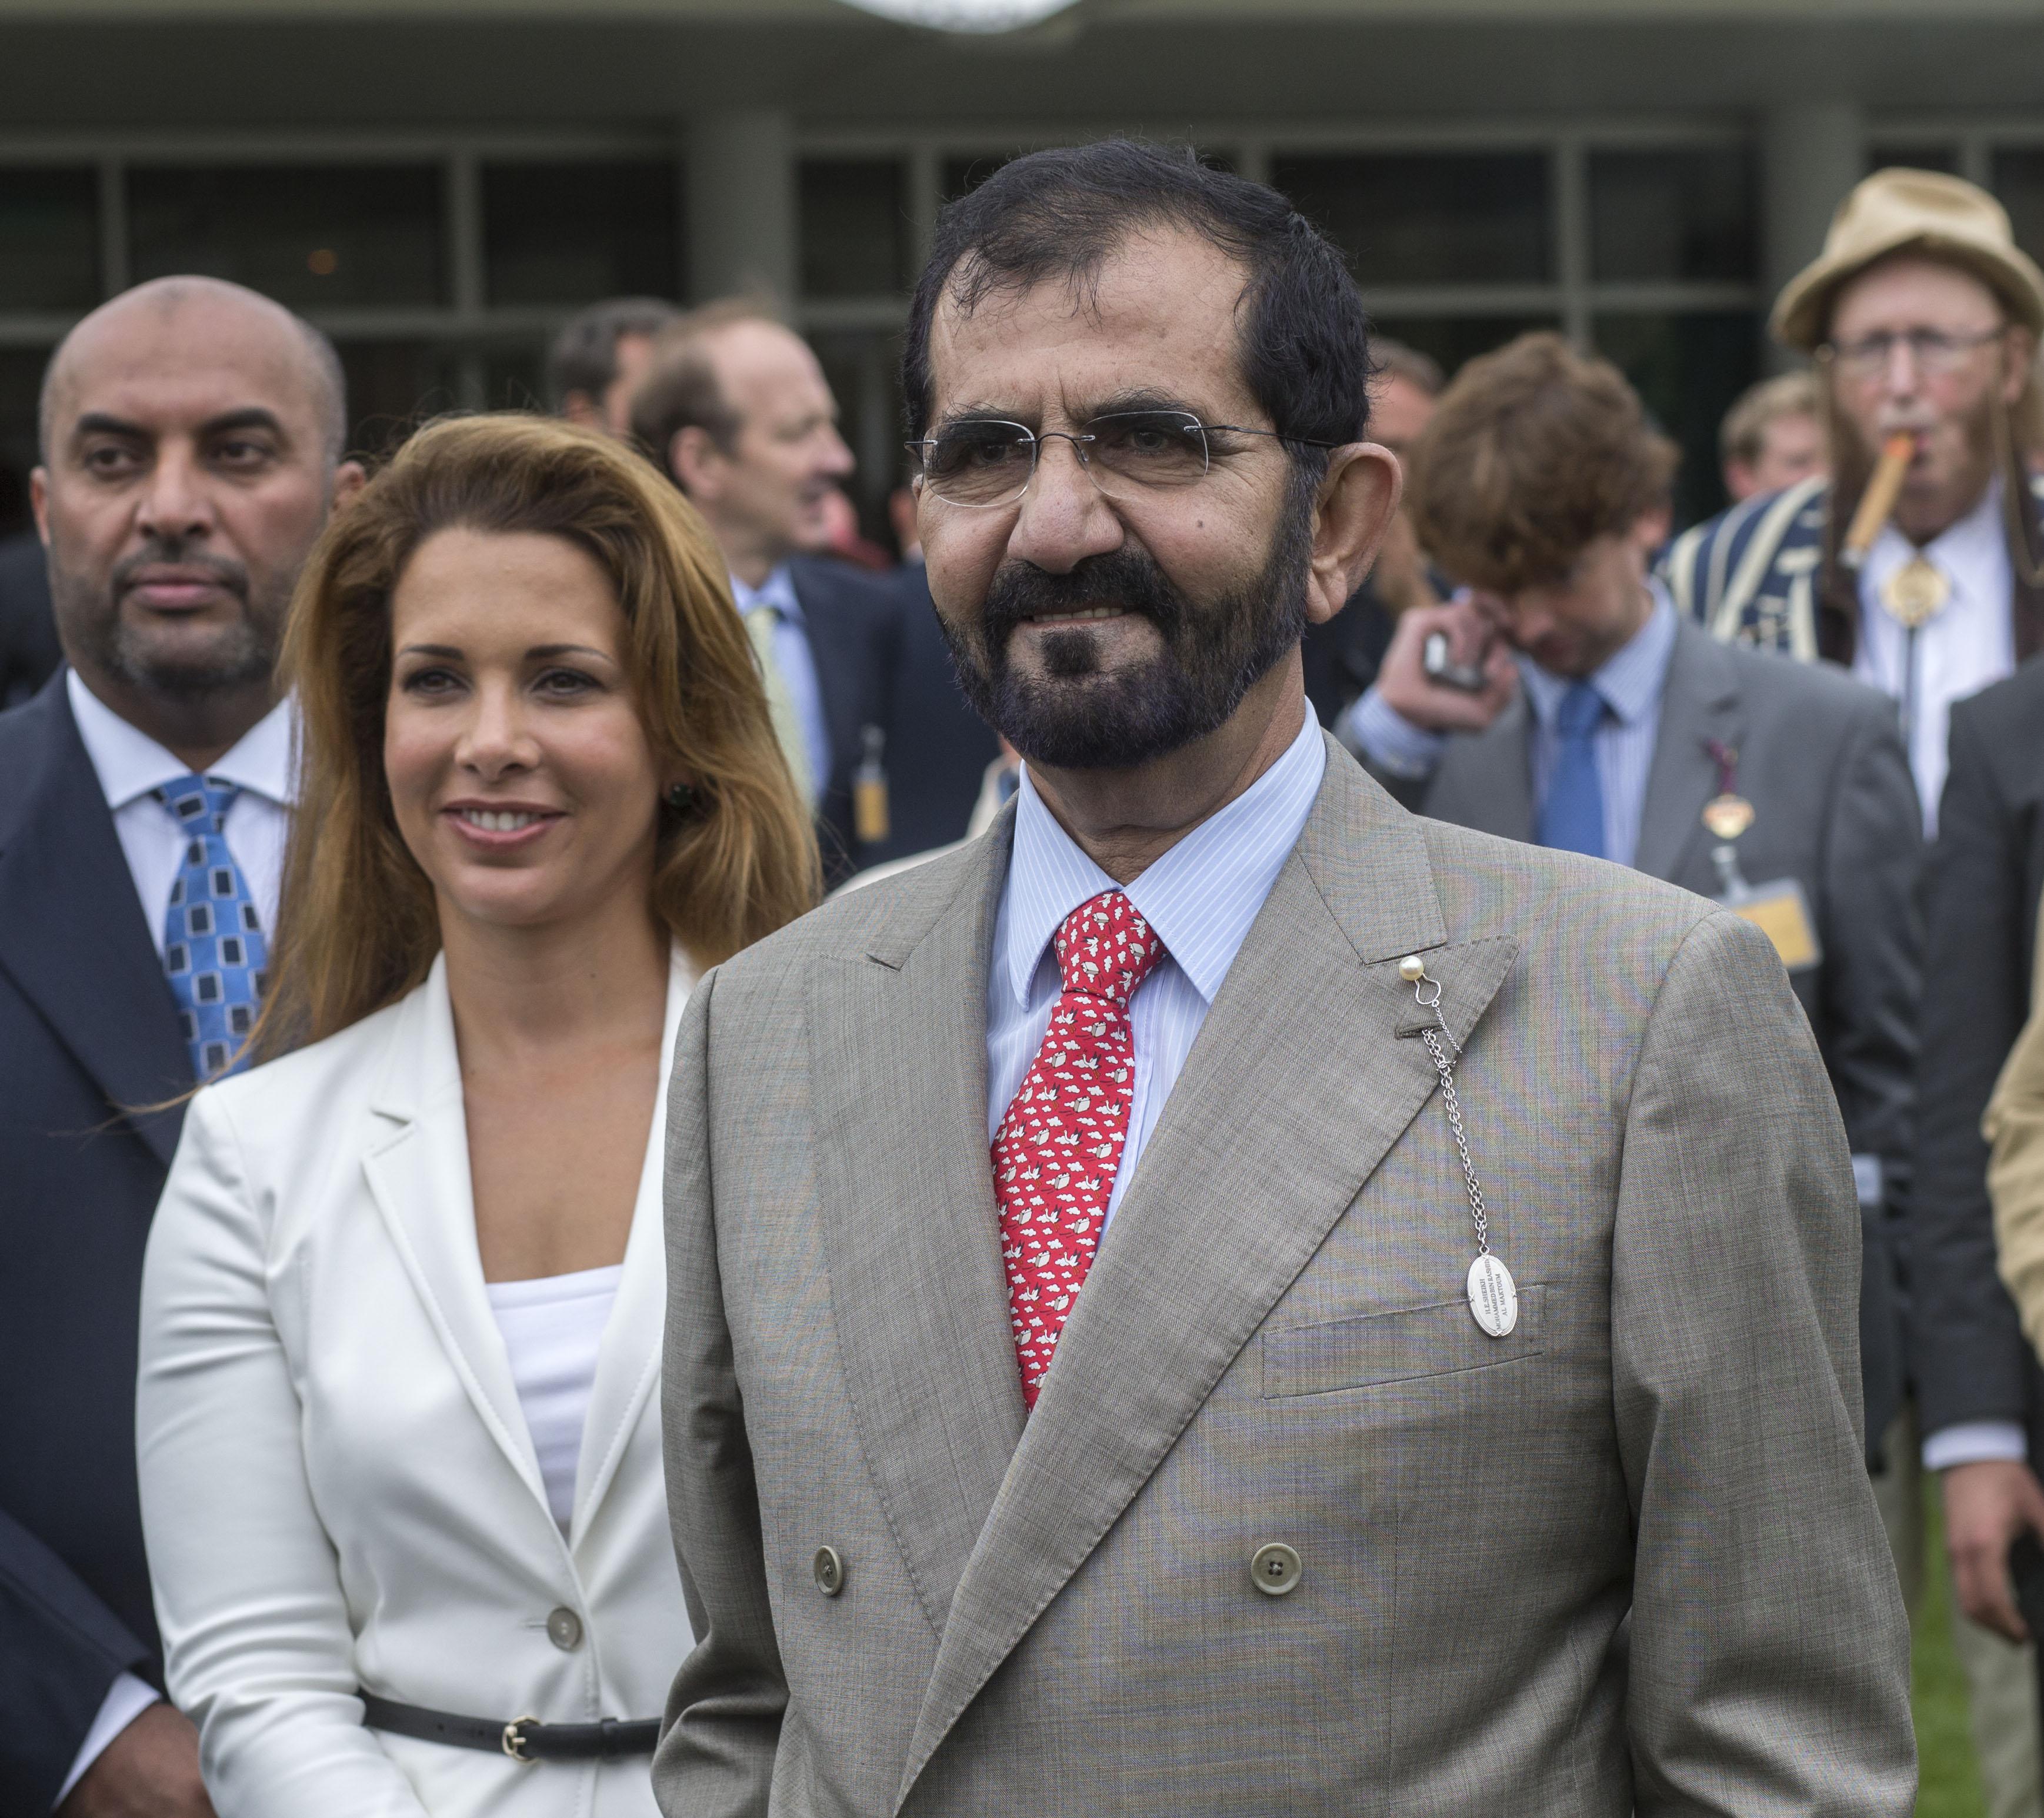 Шейх Дубая Мухаммед аль-Мактум ипринцесса Хайя бинт аль-Хусейн